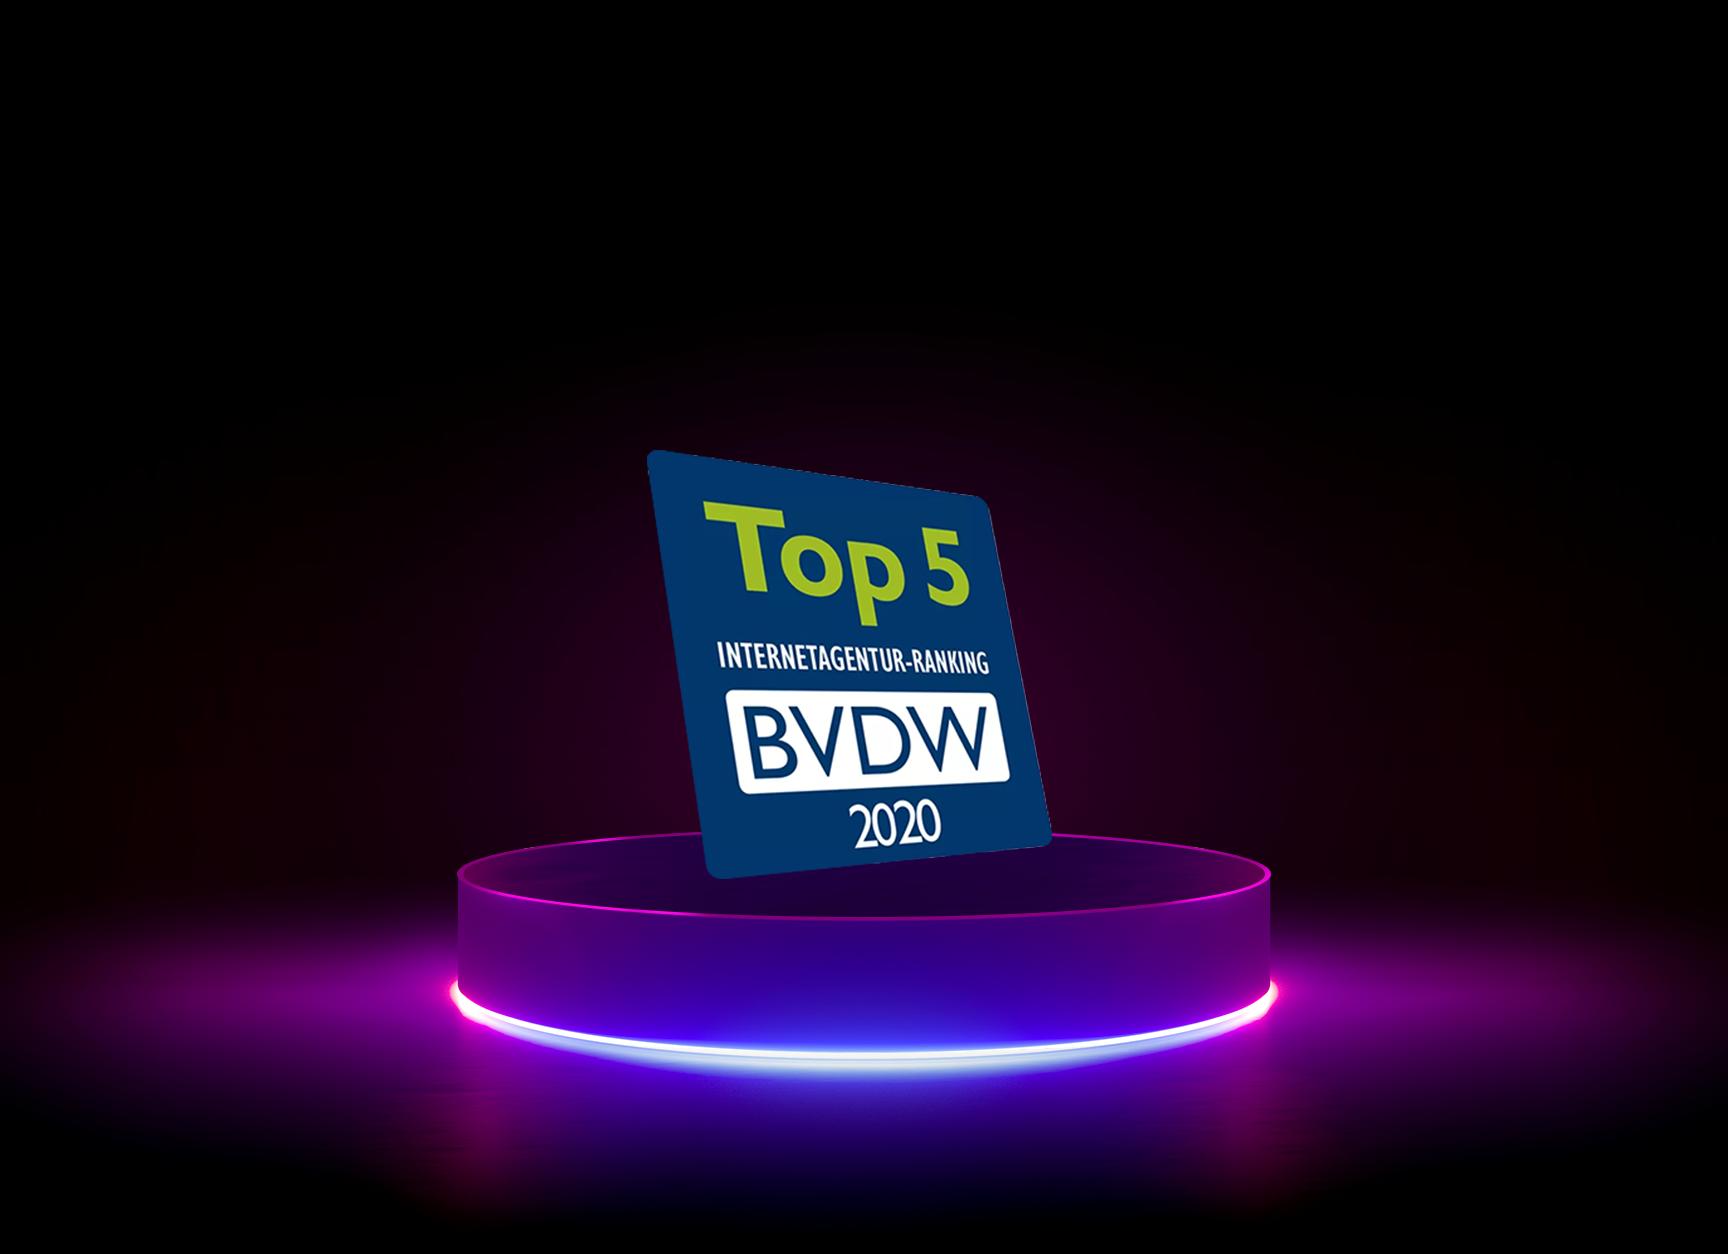 Internetagentur-Ranking 2020: diva-e erneut unter den Top 5